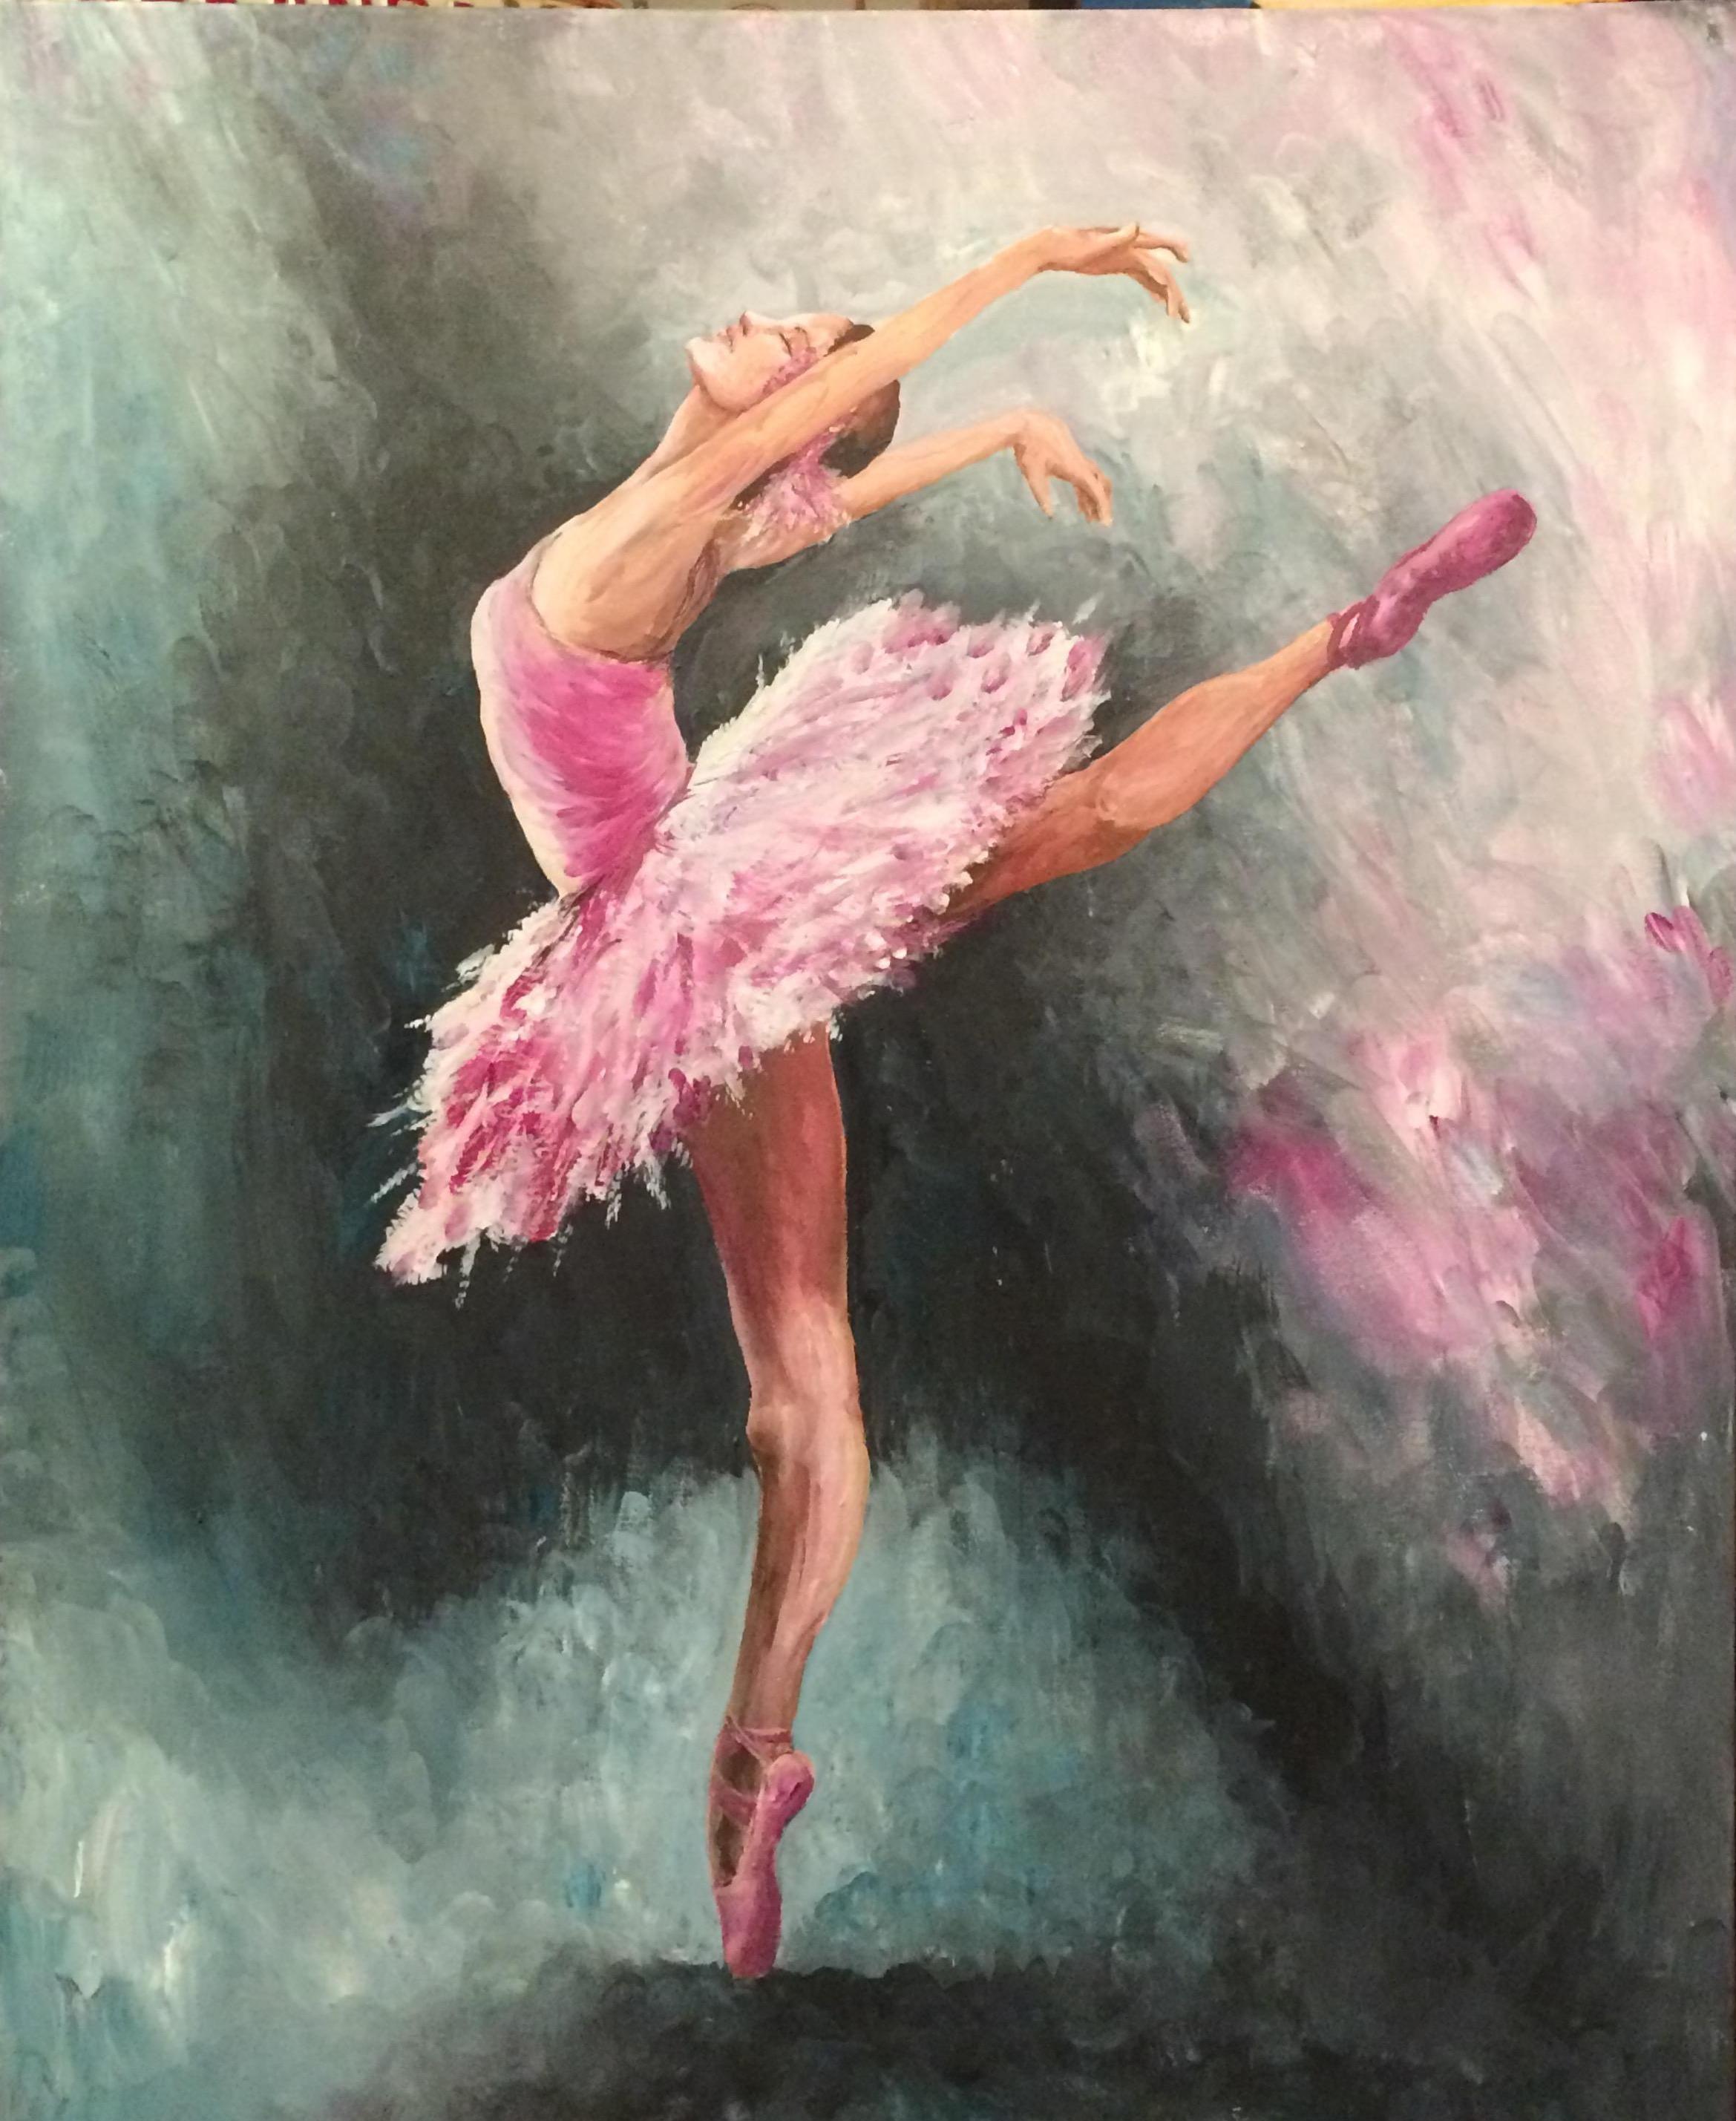 трафарета картинки балет живопись убирает зерно или